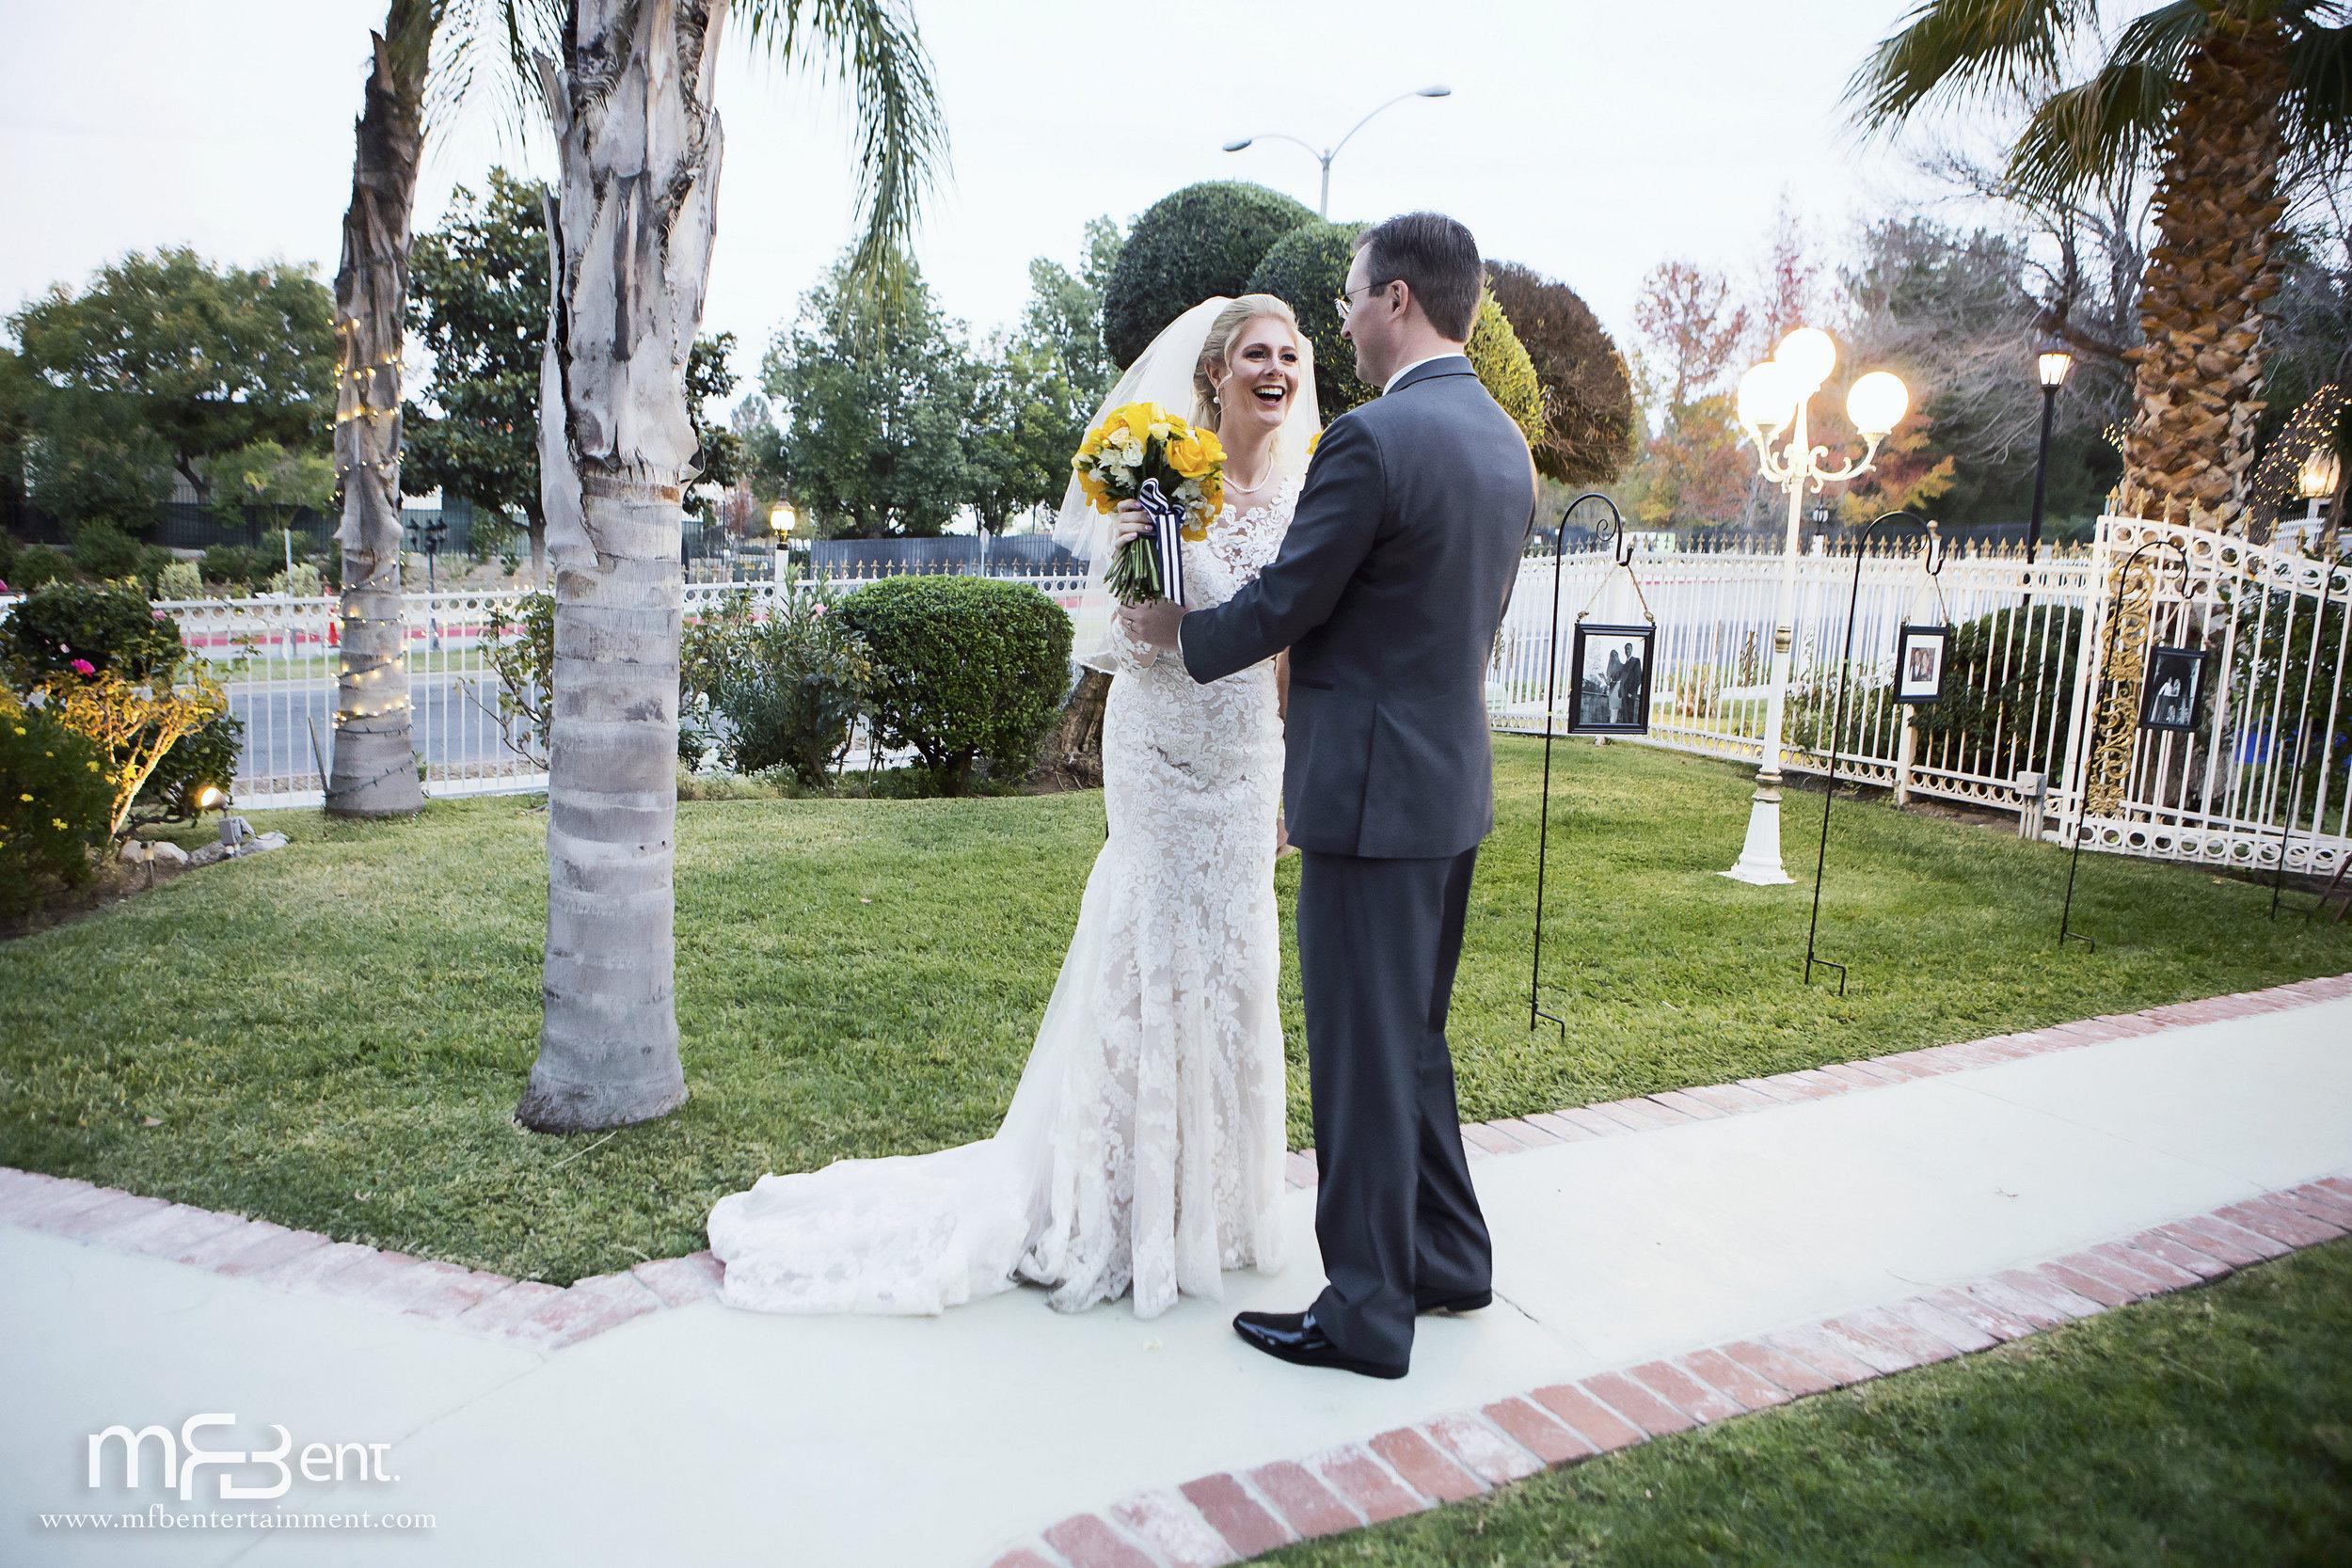 PIOTR CHELSEA WEDDING-PHOTO SESSION-0030 L.jpg